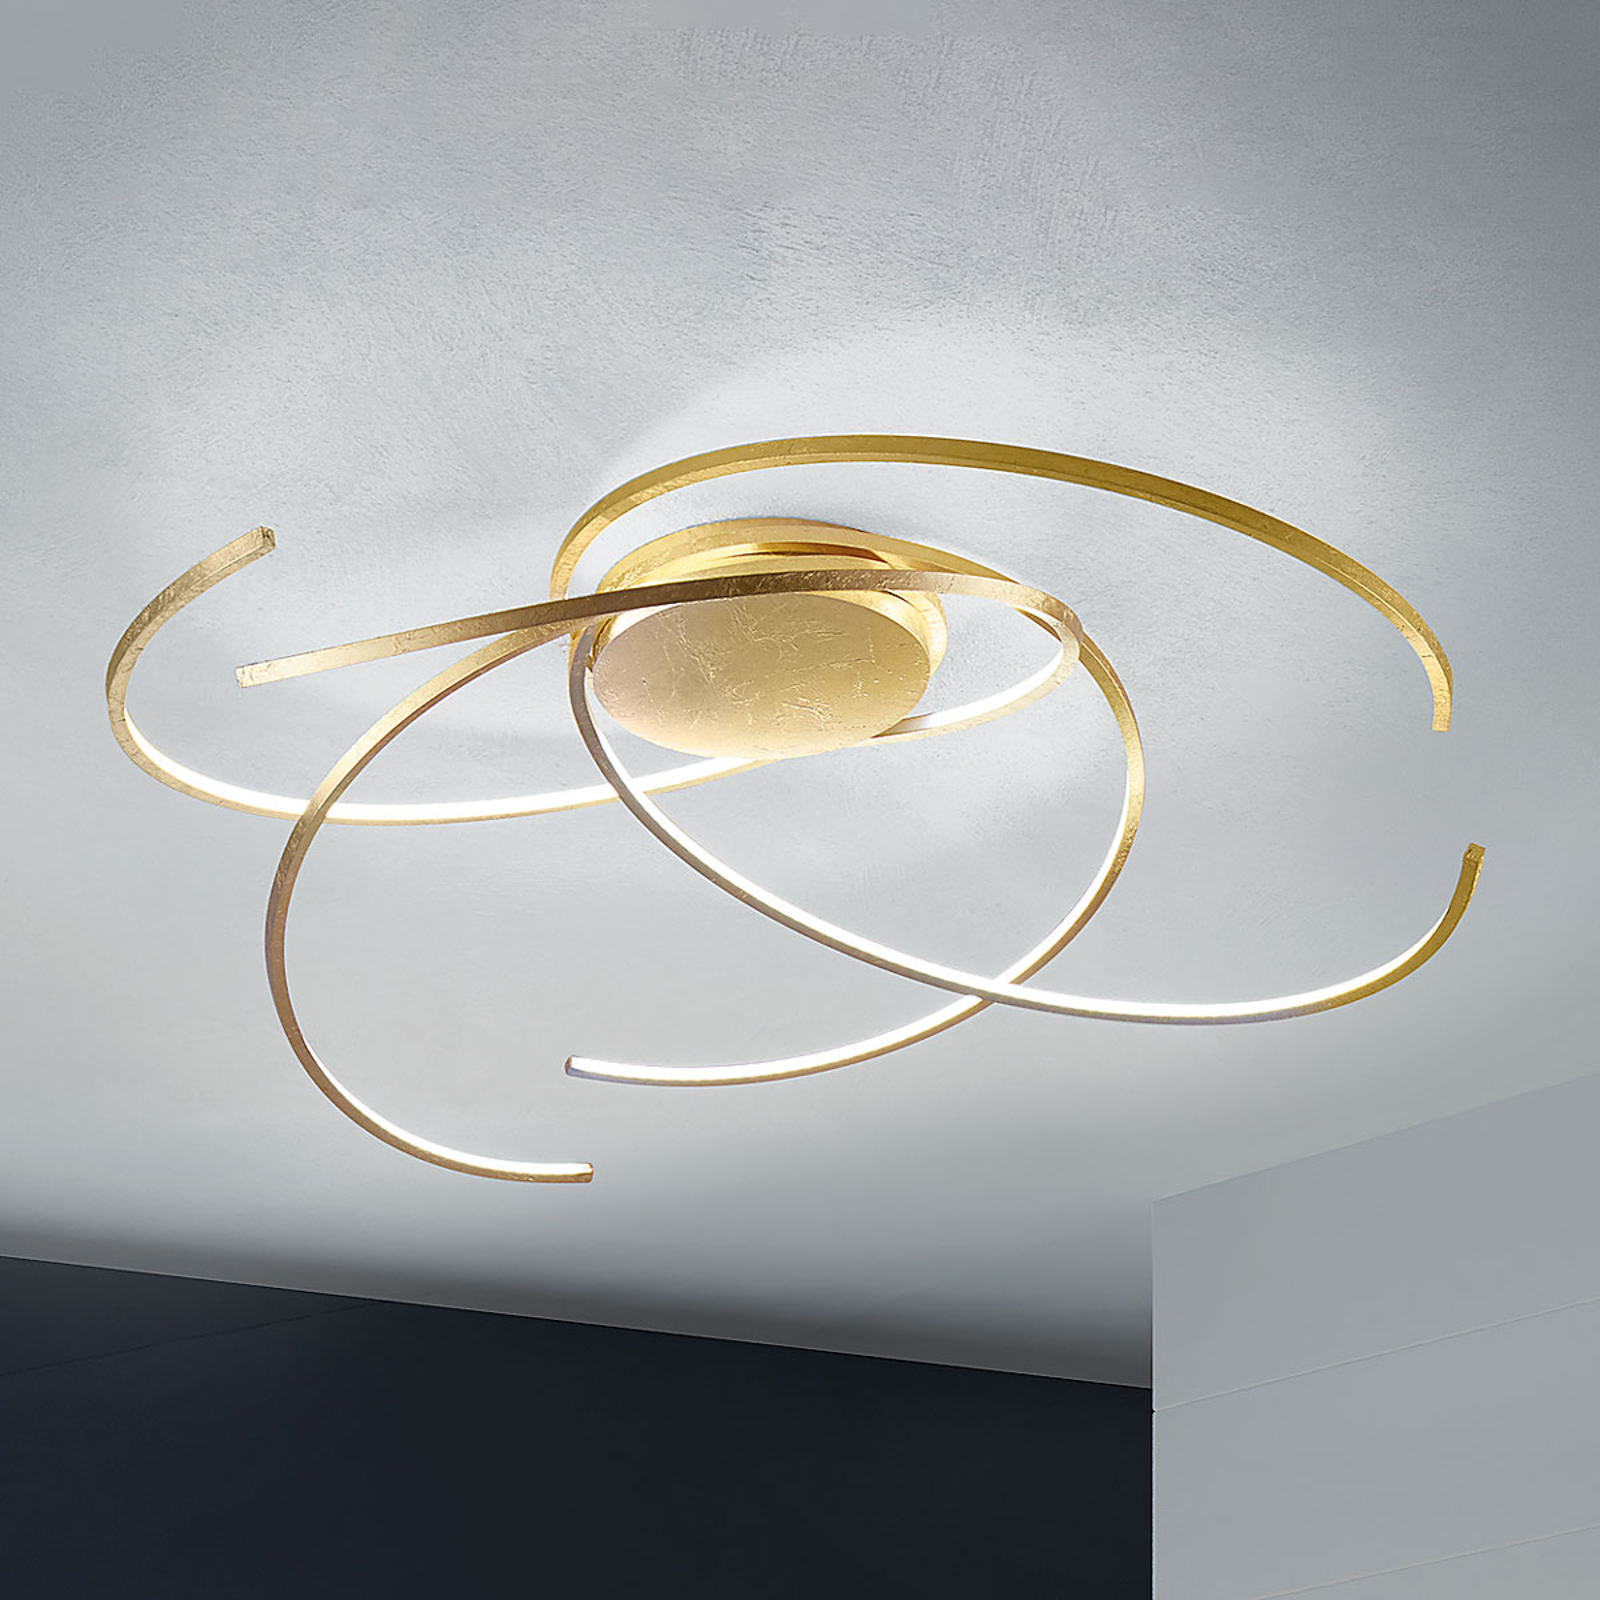 Escale Space - LED-Deckenlampe, 80 cm, Blattgold